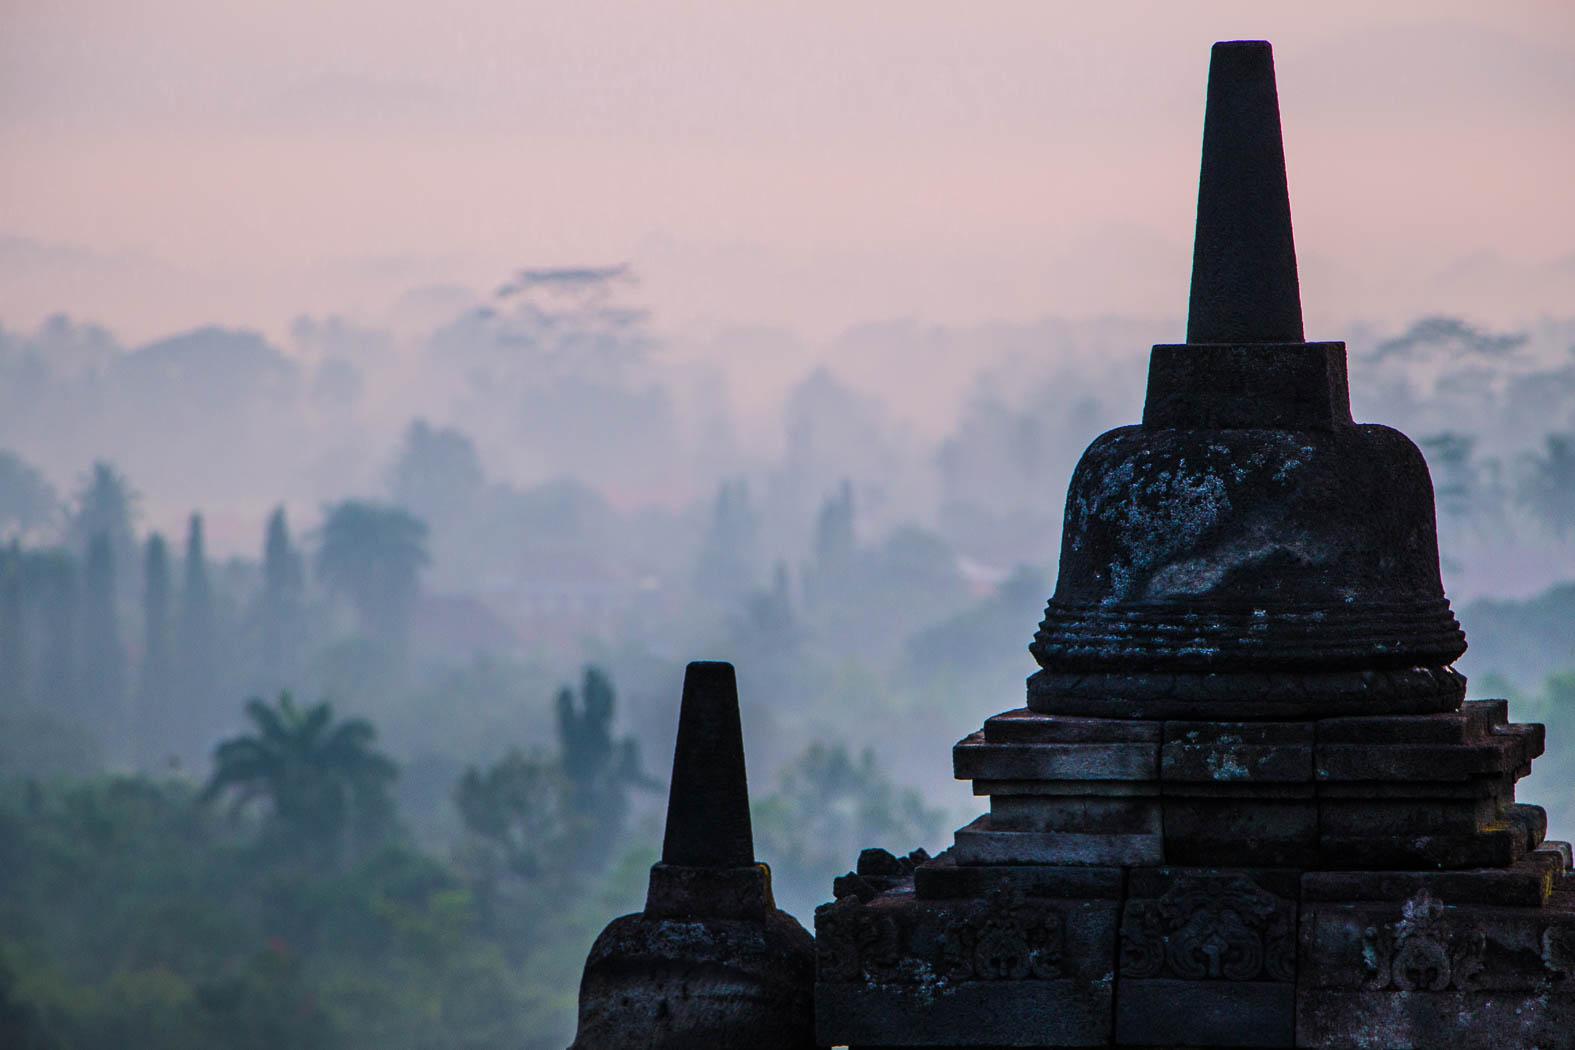 borobudur-und-prambanan-tempel-sunrise-nebel-fog-guten-morgen-yogyakarta-indonesia-indonesien-nadine-kolbe-reise-influencer